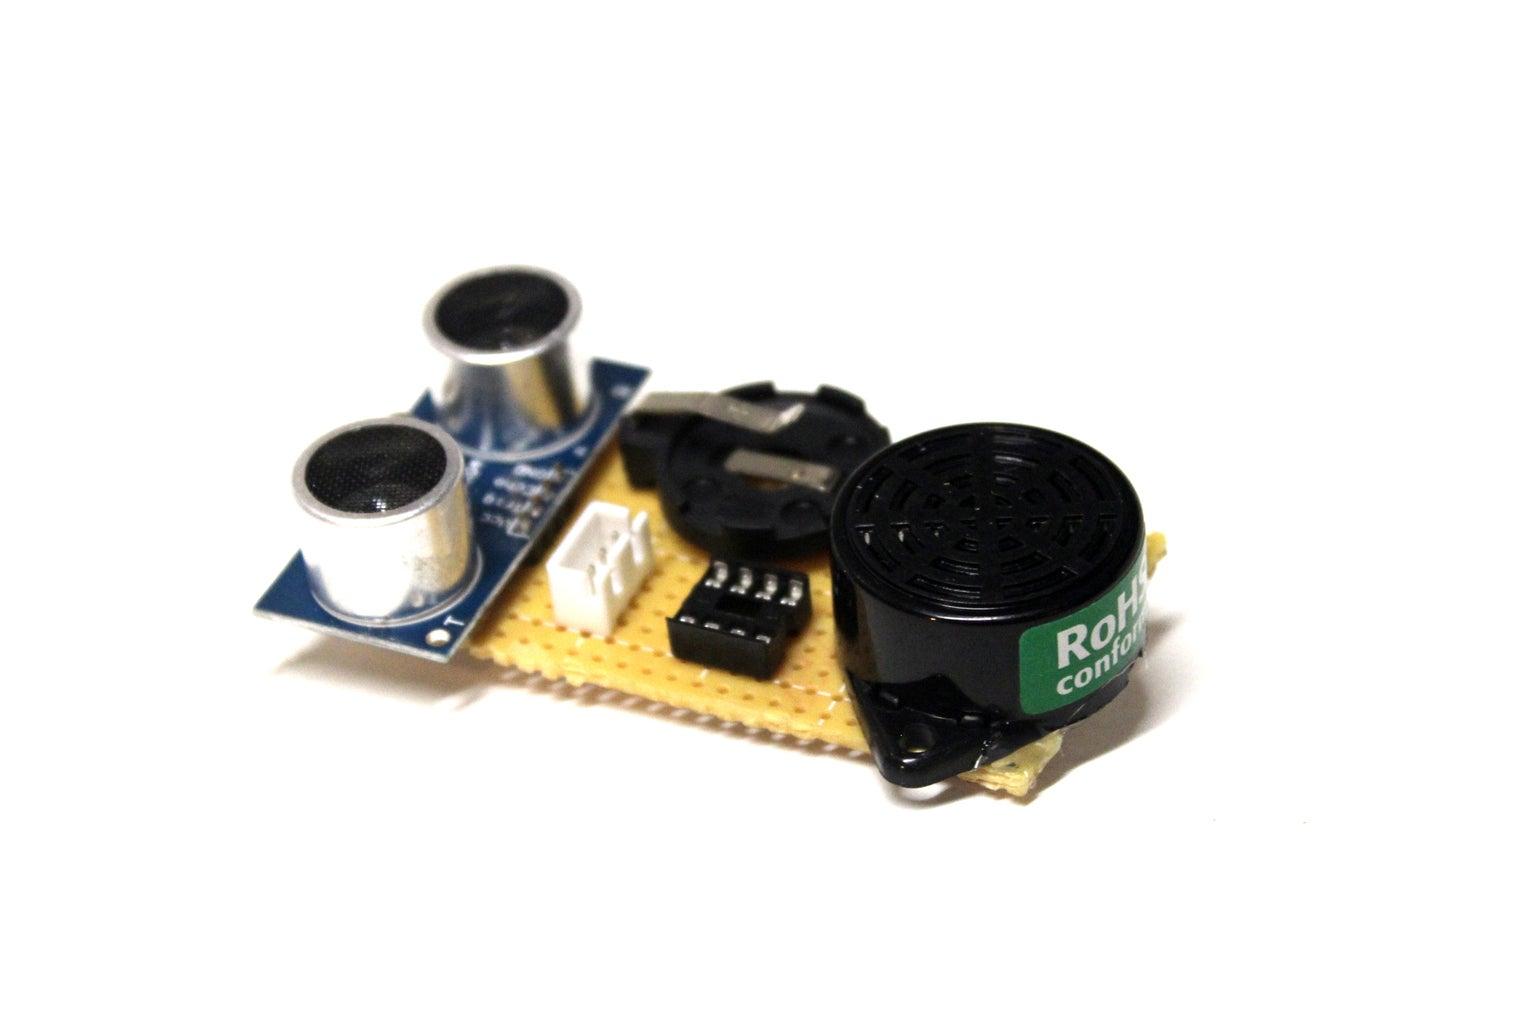 Solder Main Components